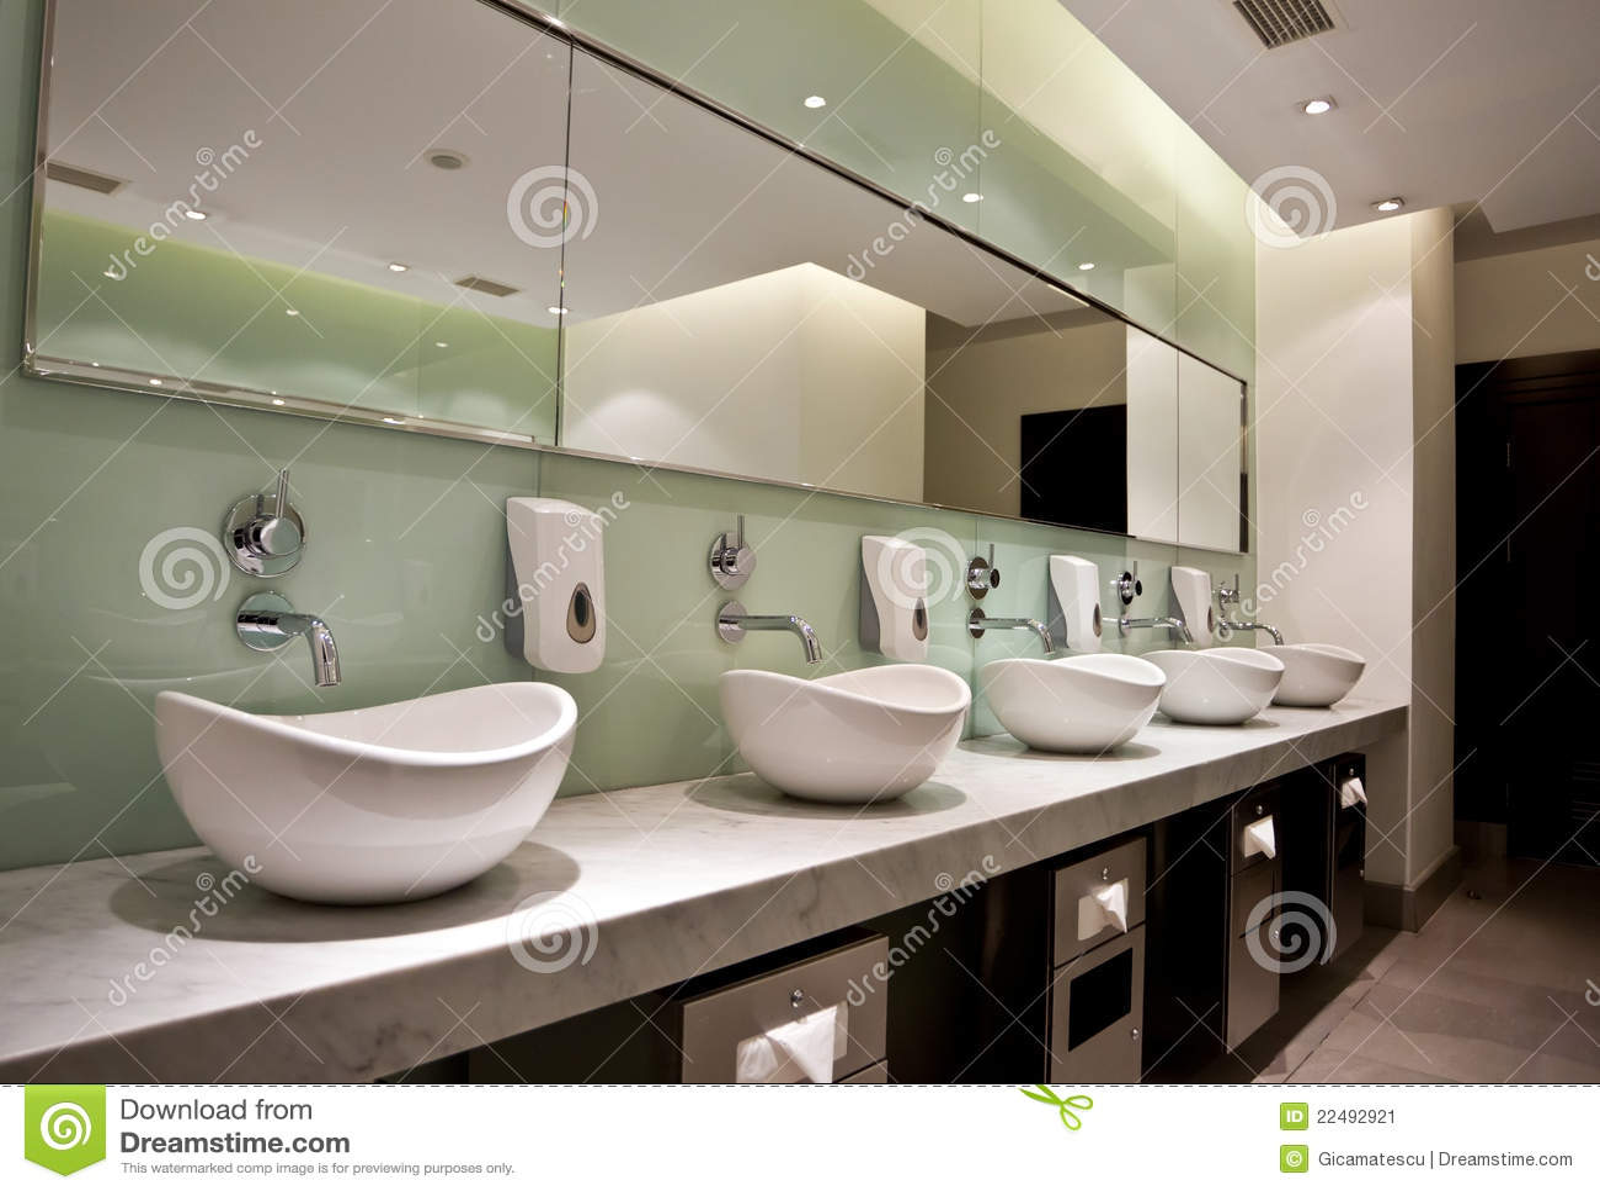 Public Restroom Stock Image  Image 22492921